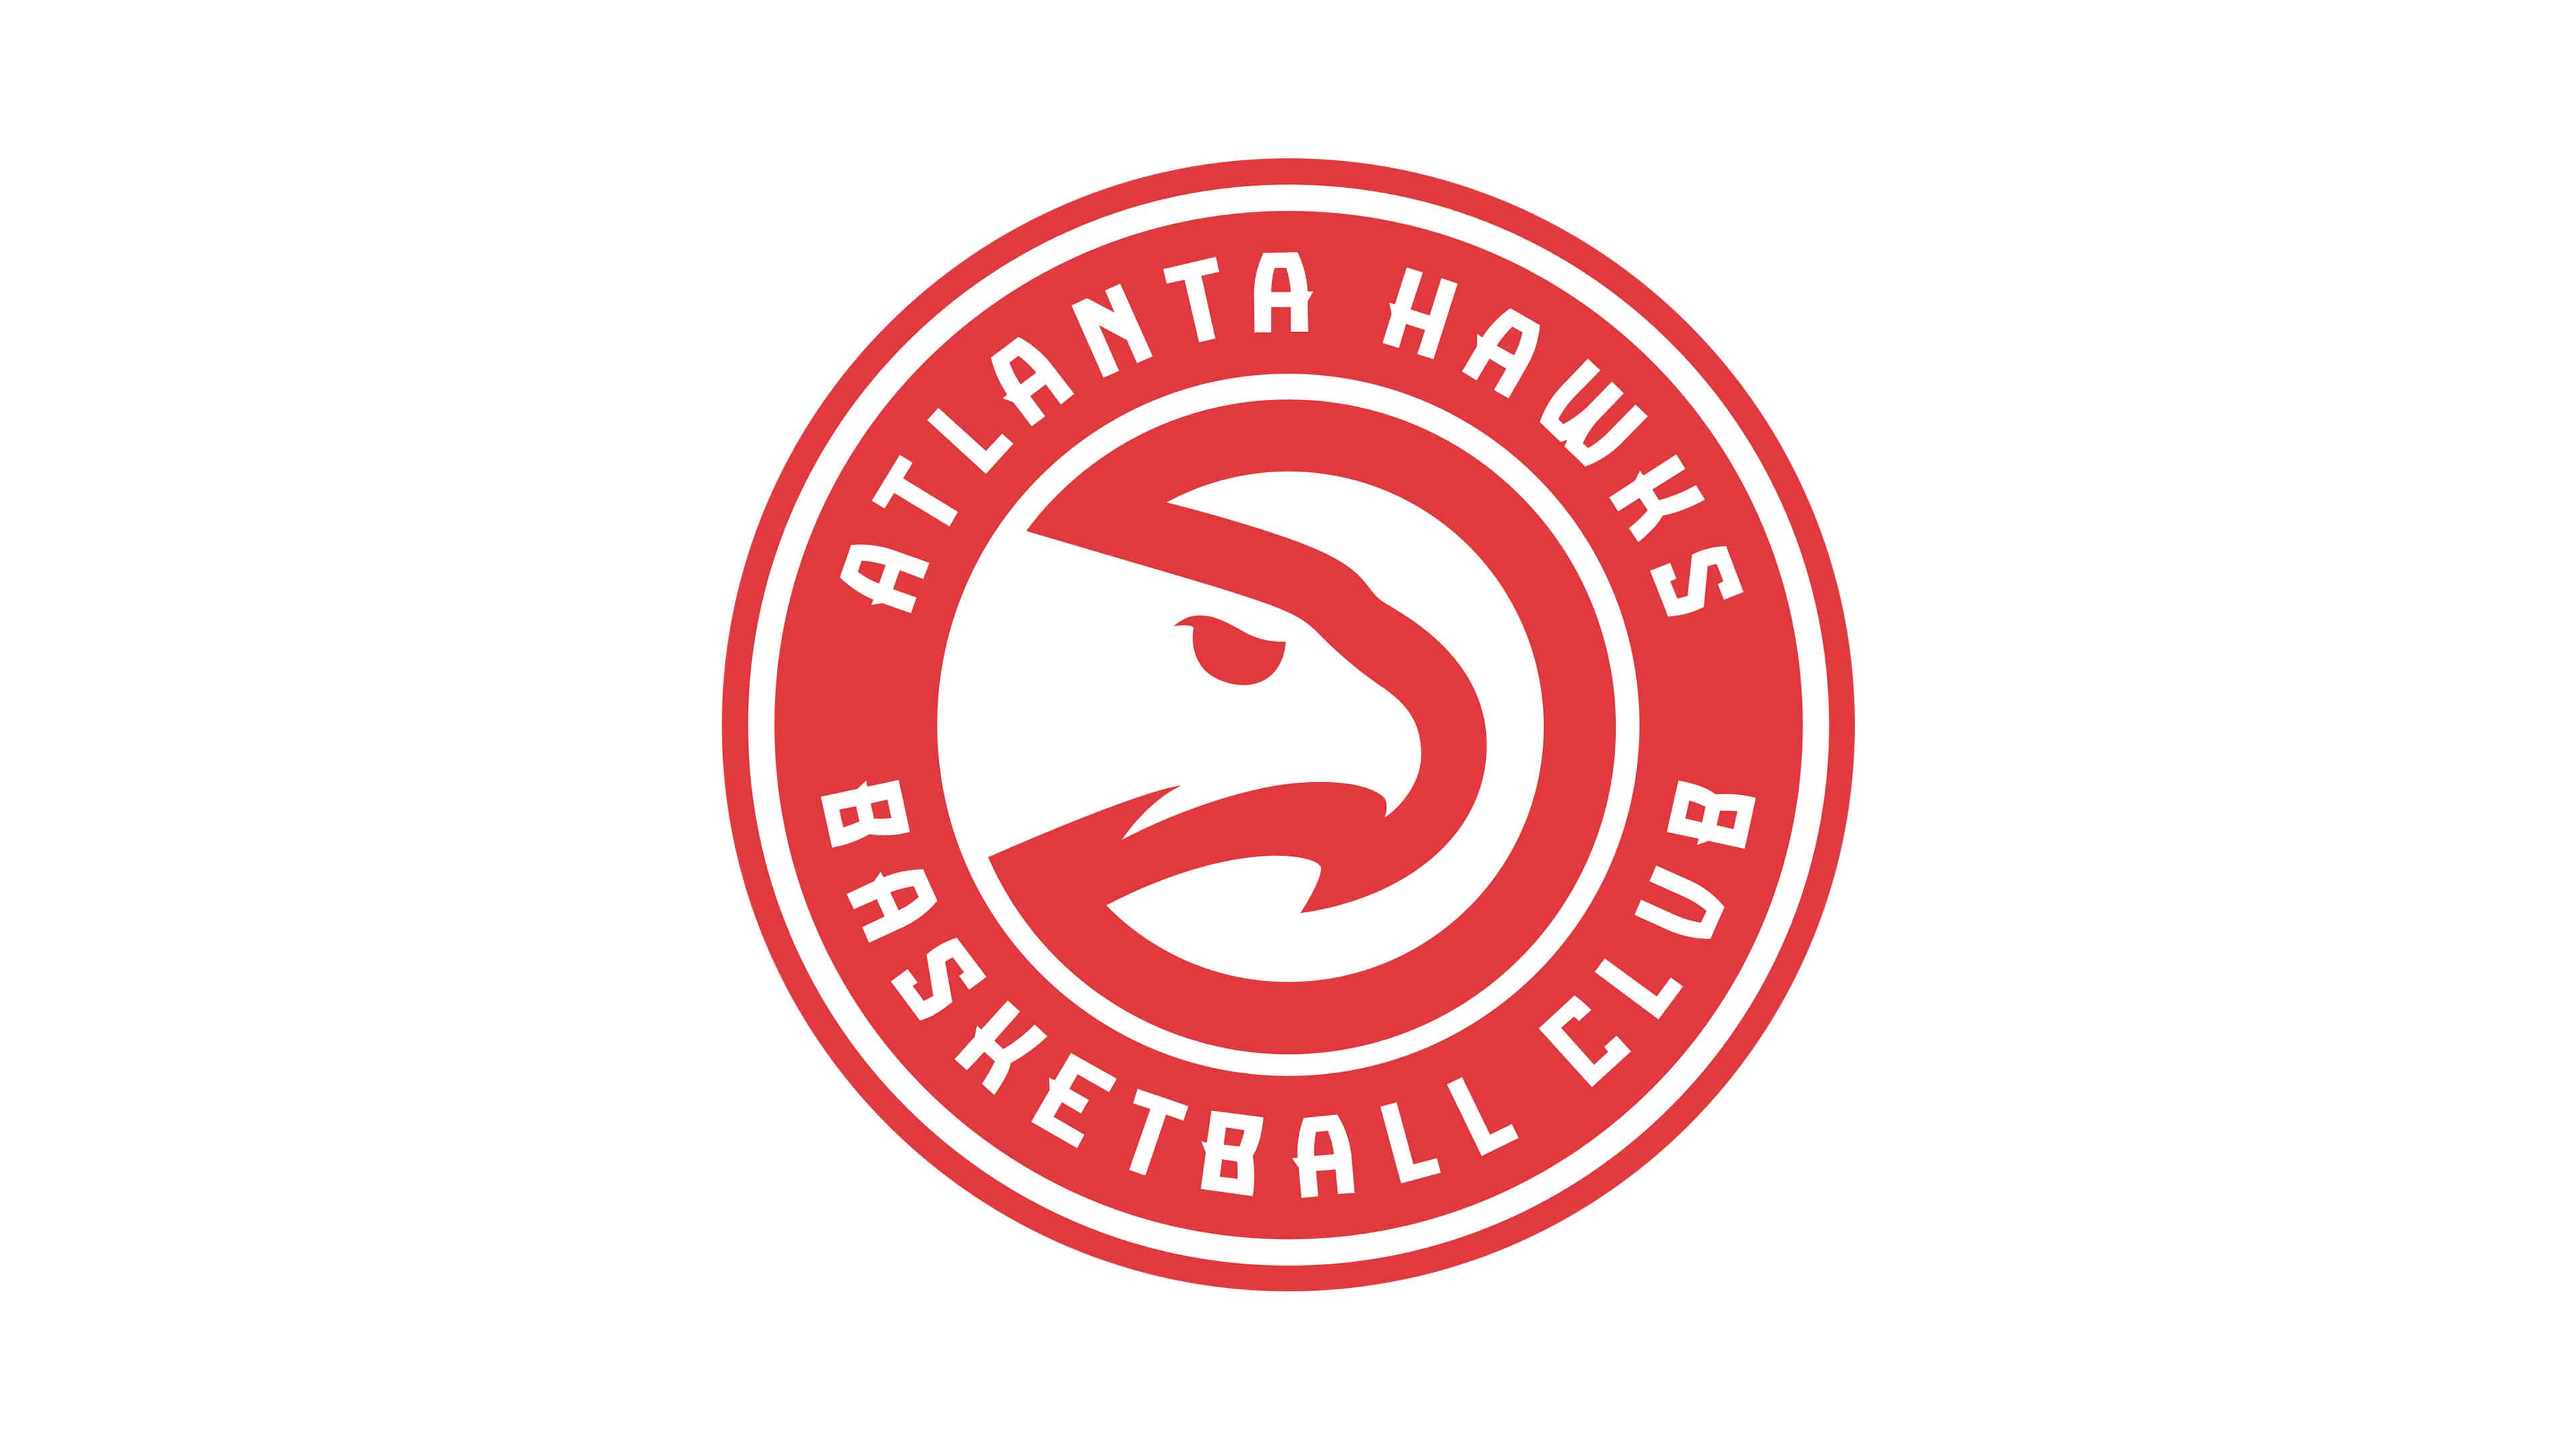 atlanta hawks nba logo uhd 4k wallpaper